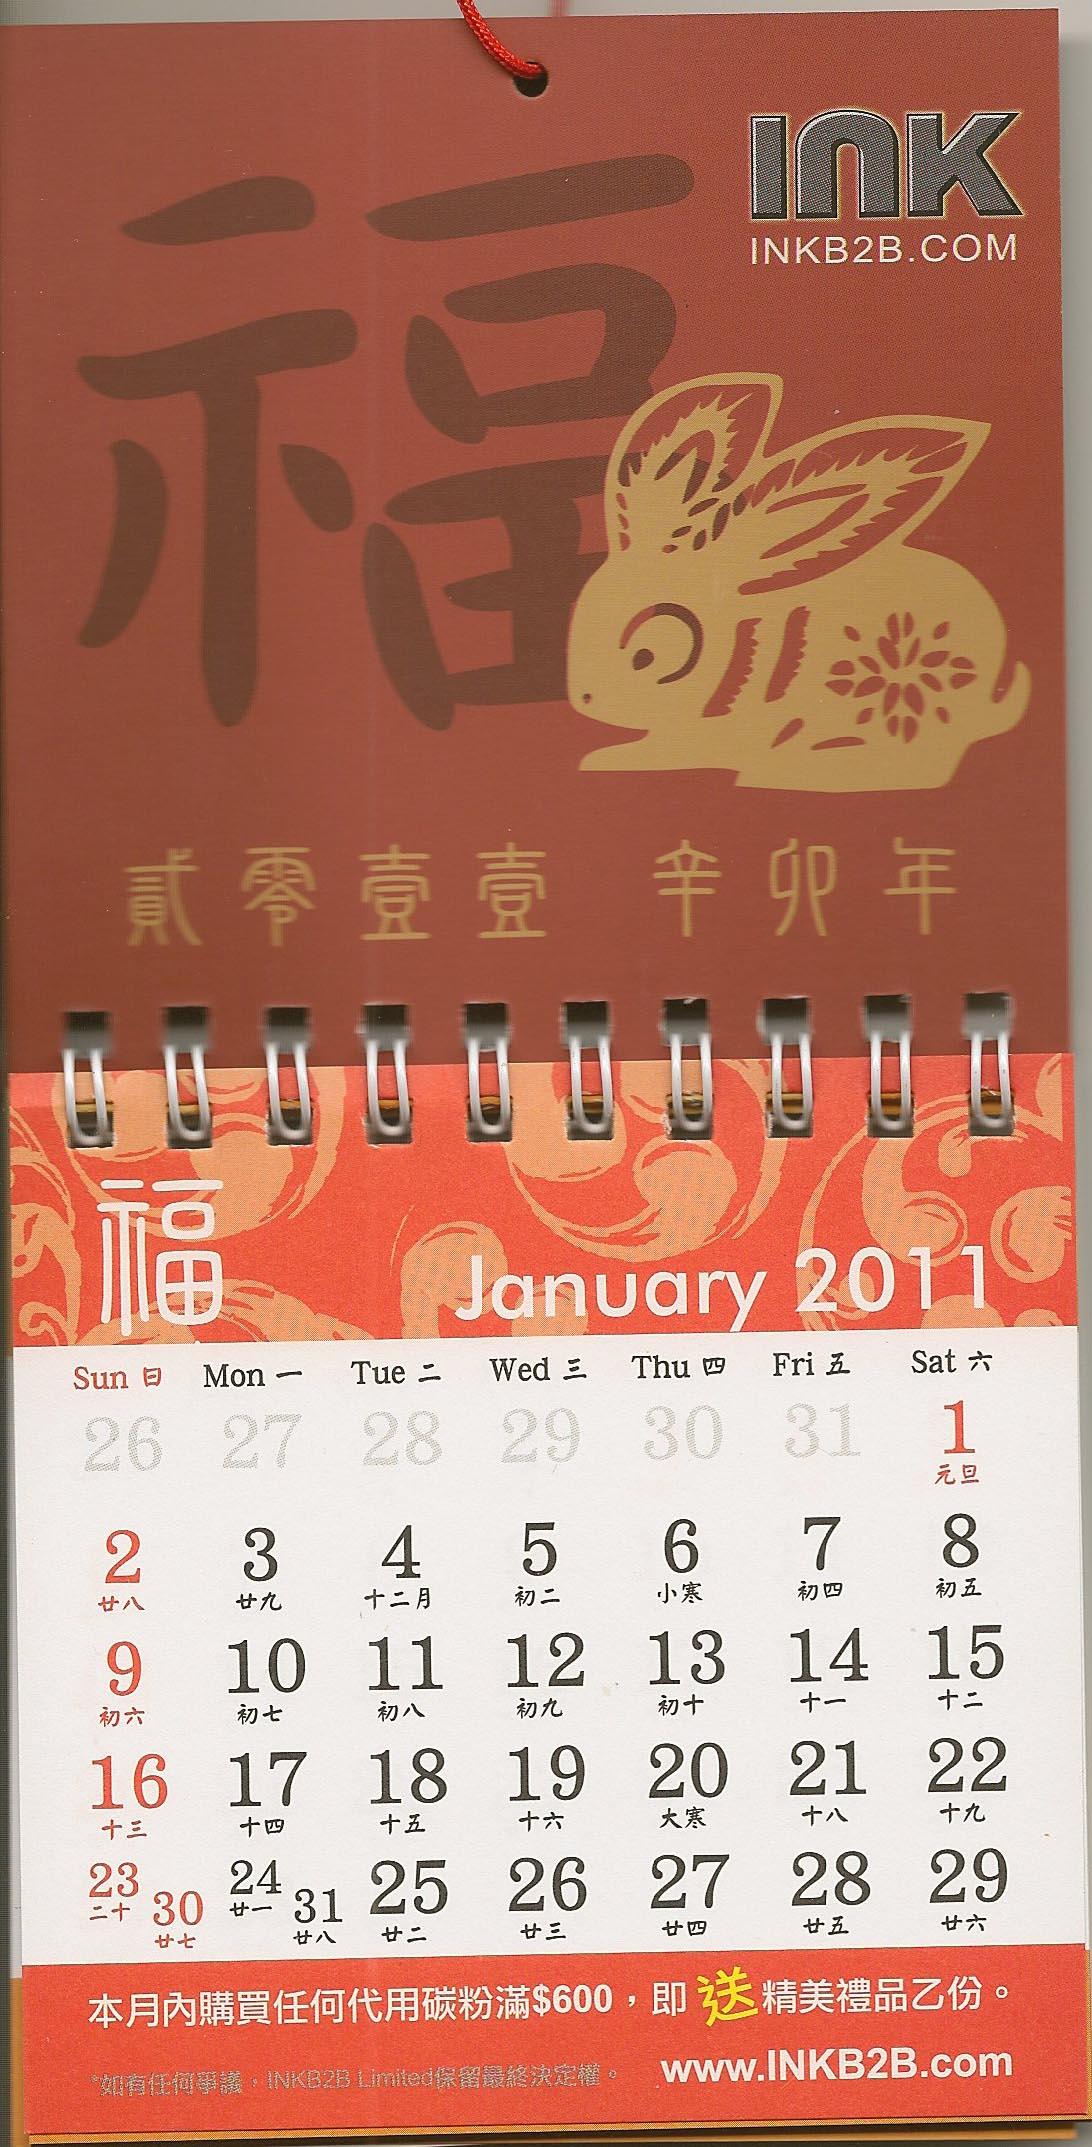 mini calandar CNY promotional product ODMAsia